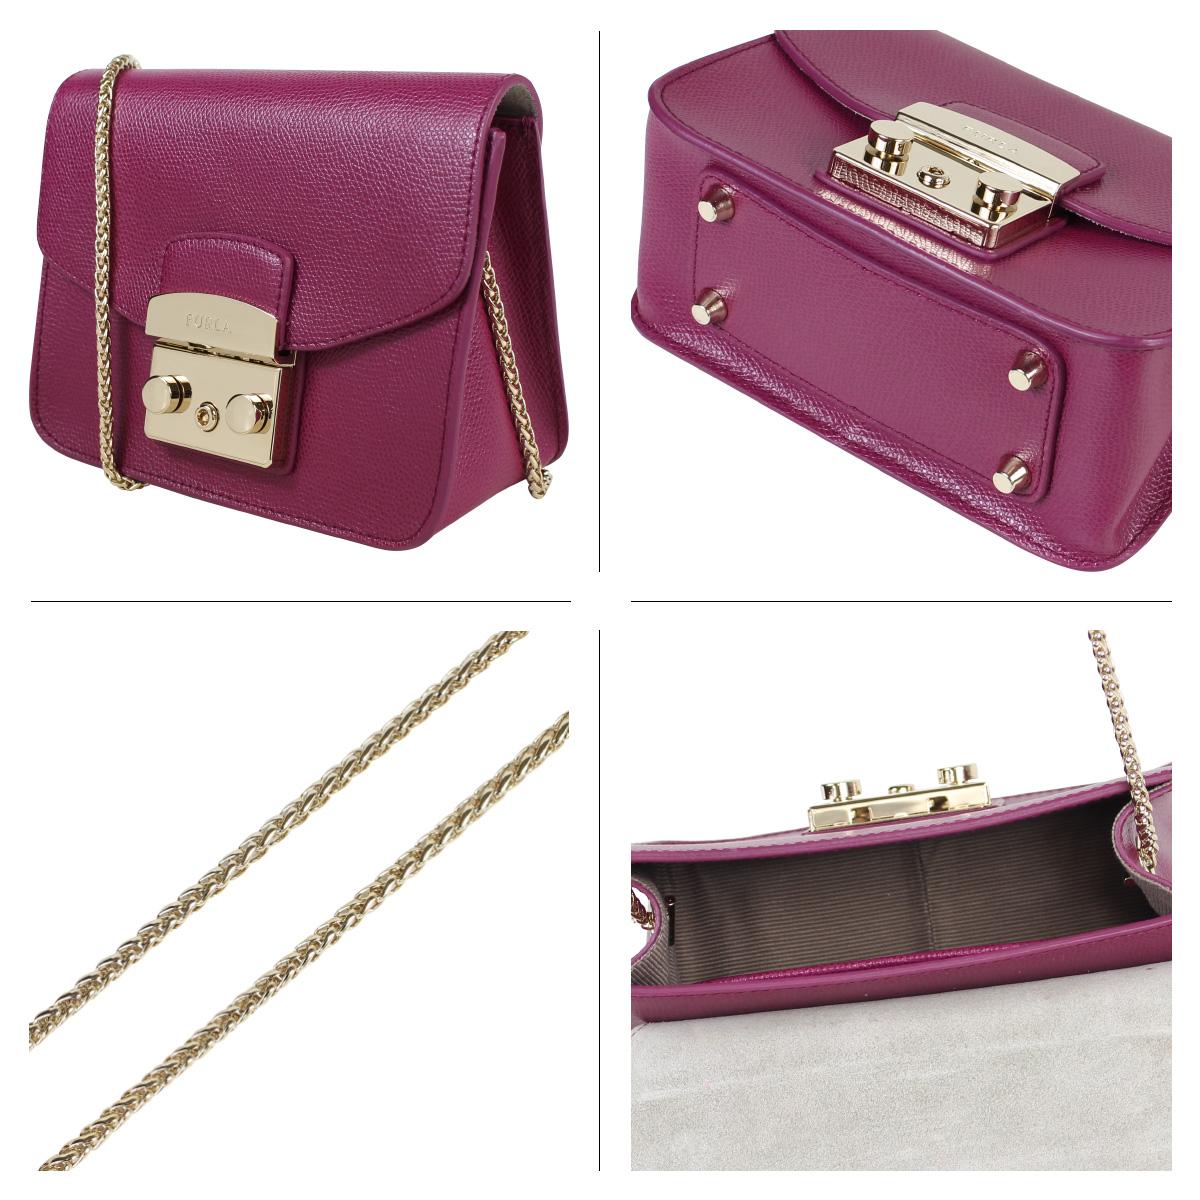 eb53a45d47 Sugar Online Shop  フルラ FURLA bag shoulder bag Lady s purple ...